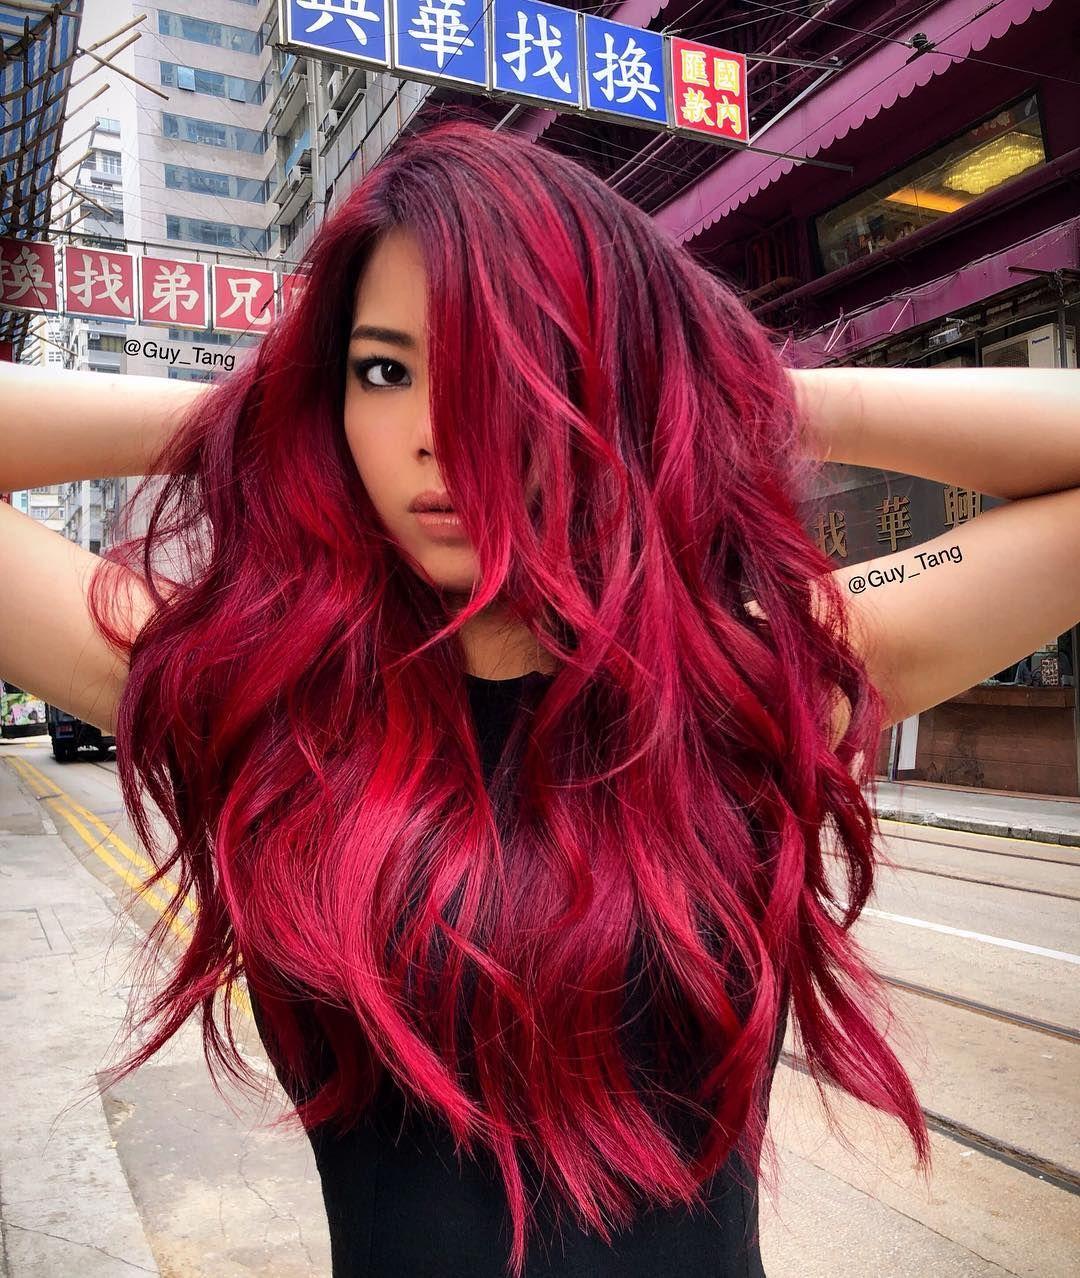 Guy Tang Spills On The Latest Trends In Hair Colour Hong Kong Tatler